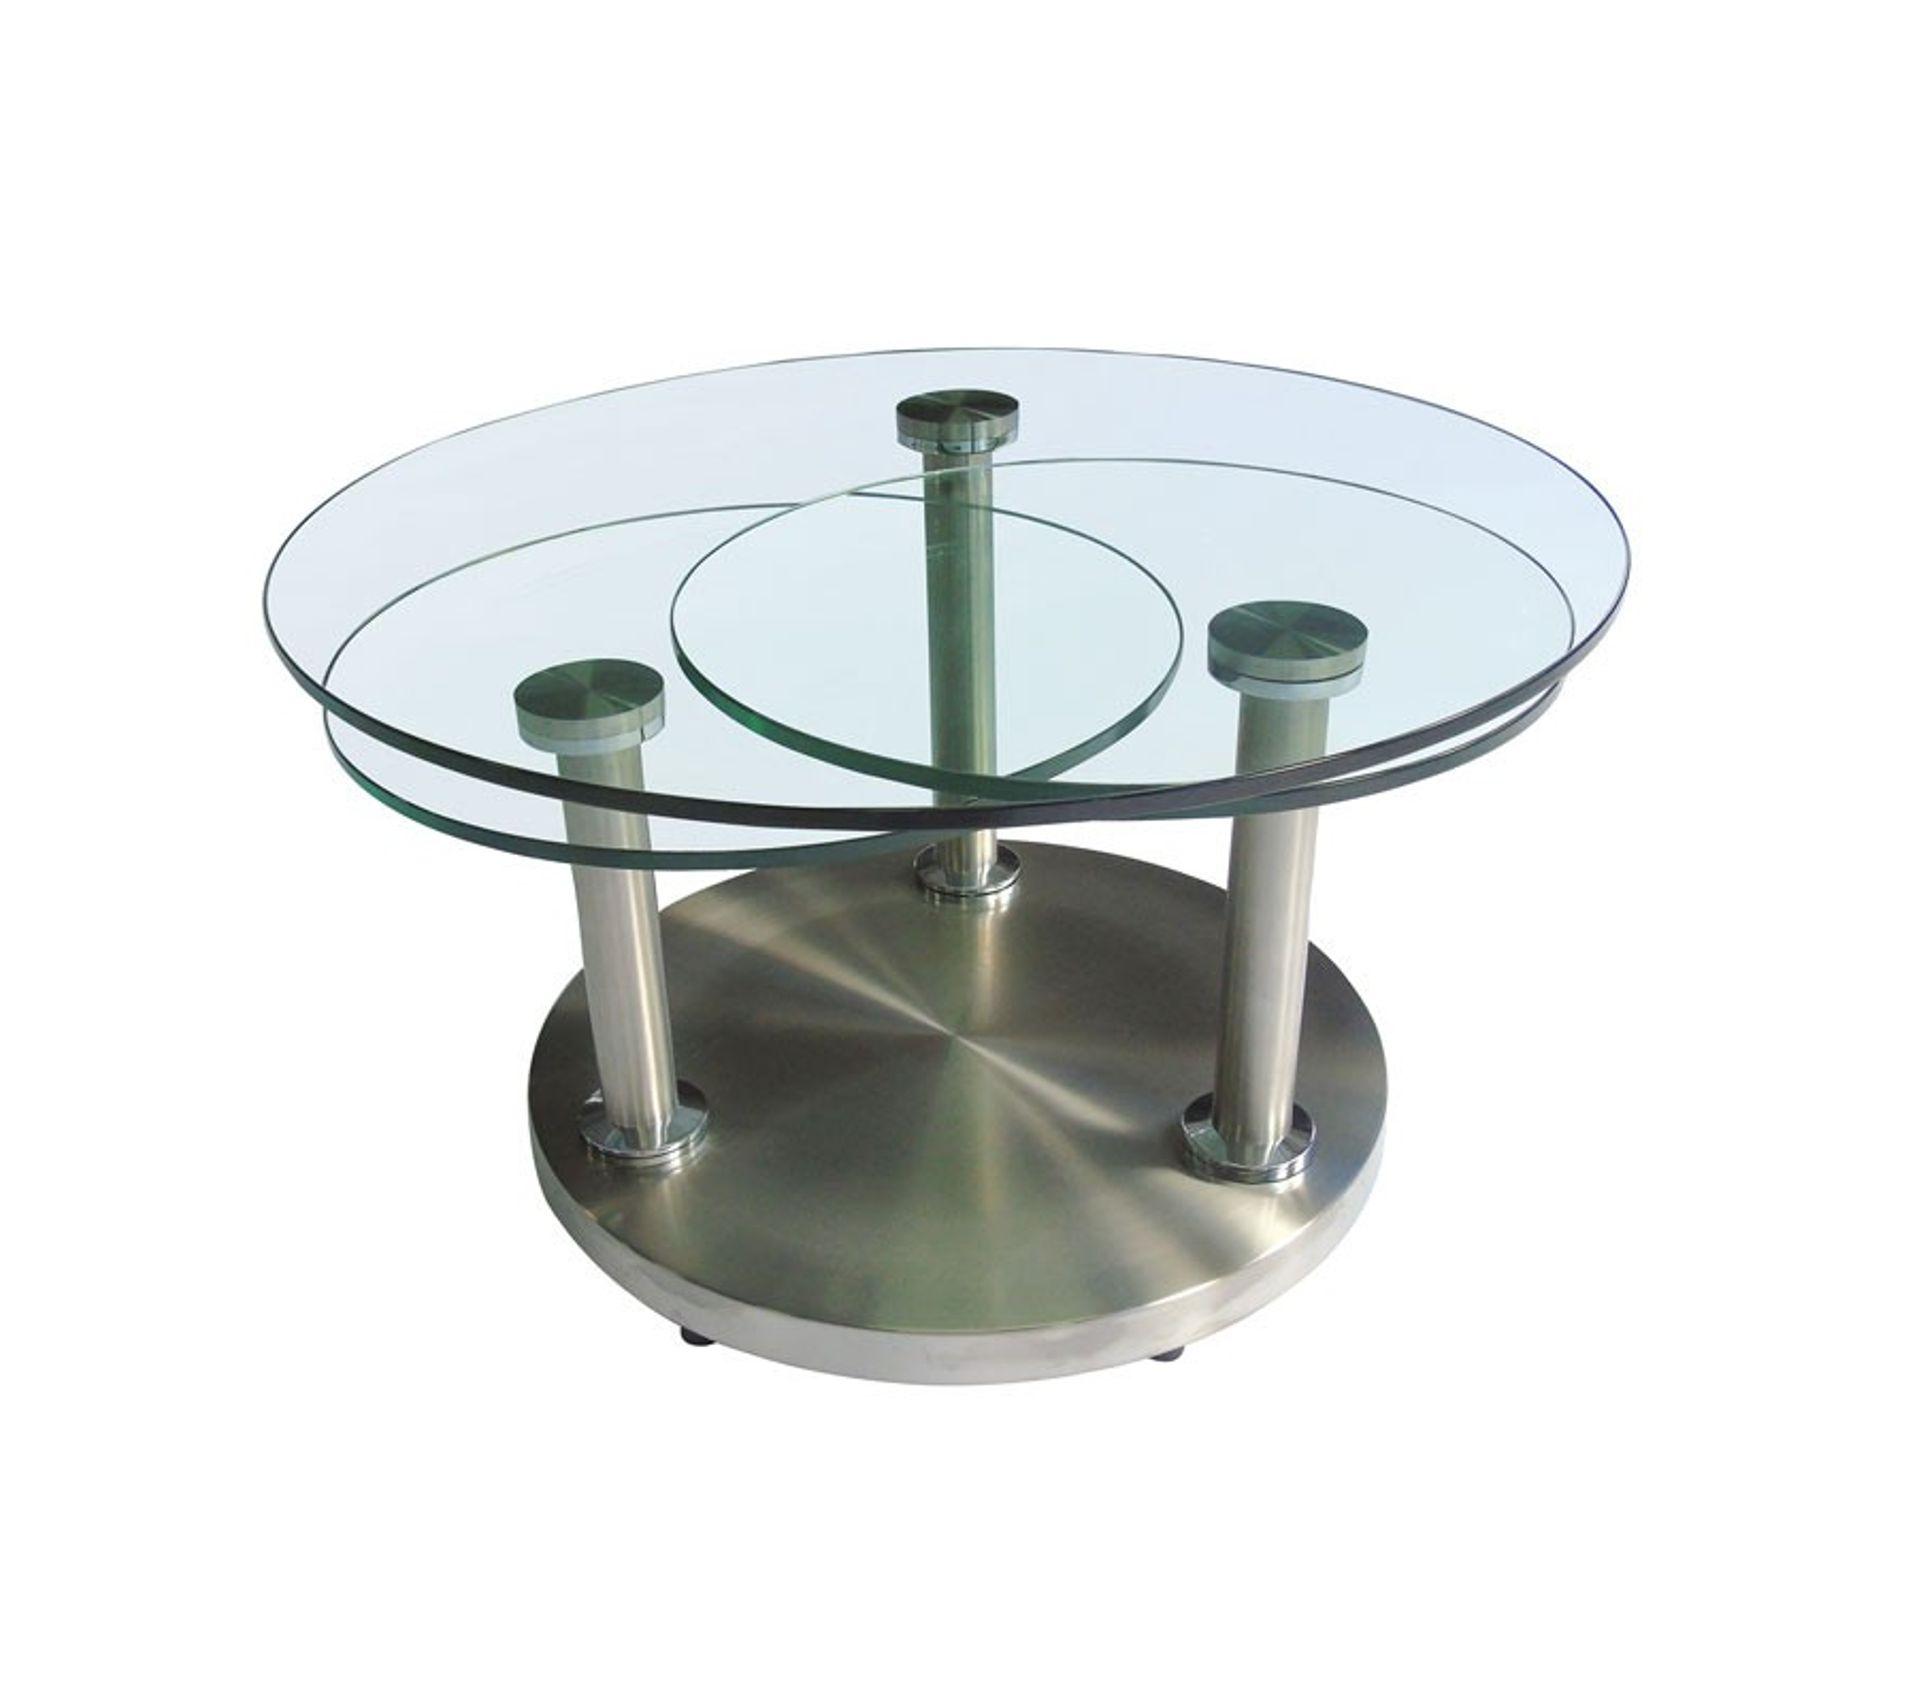 Table Basse Articulee Verre Et Metal Trygo Table Basse But